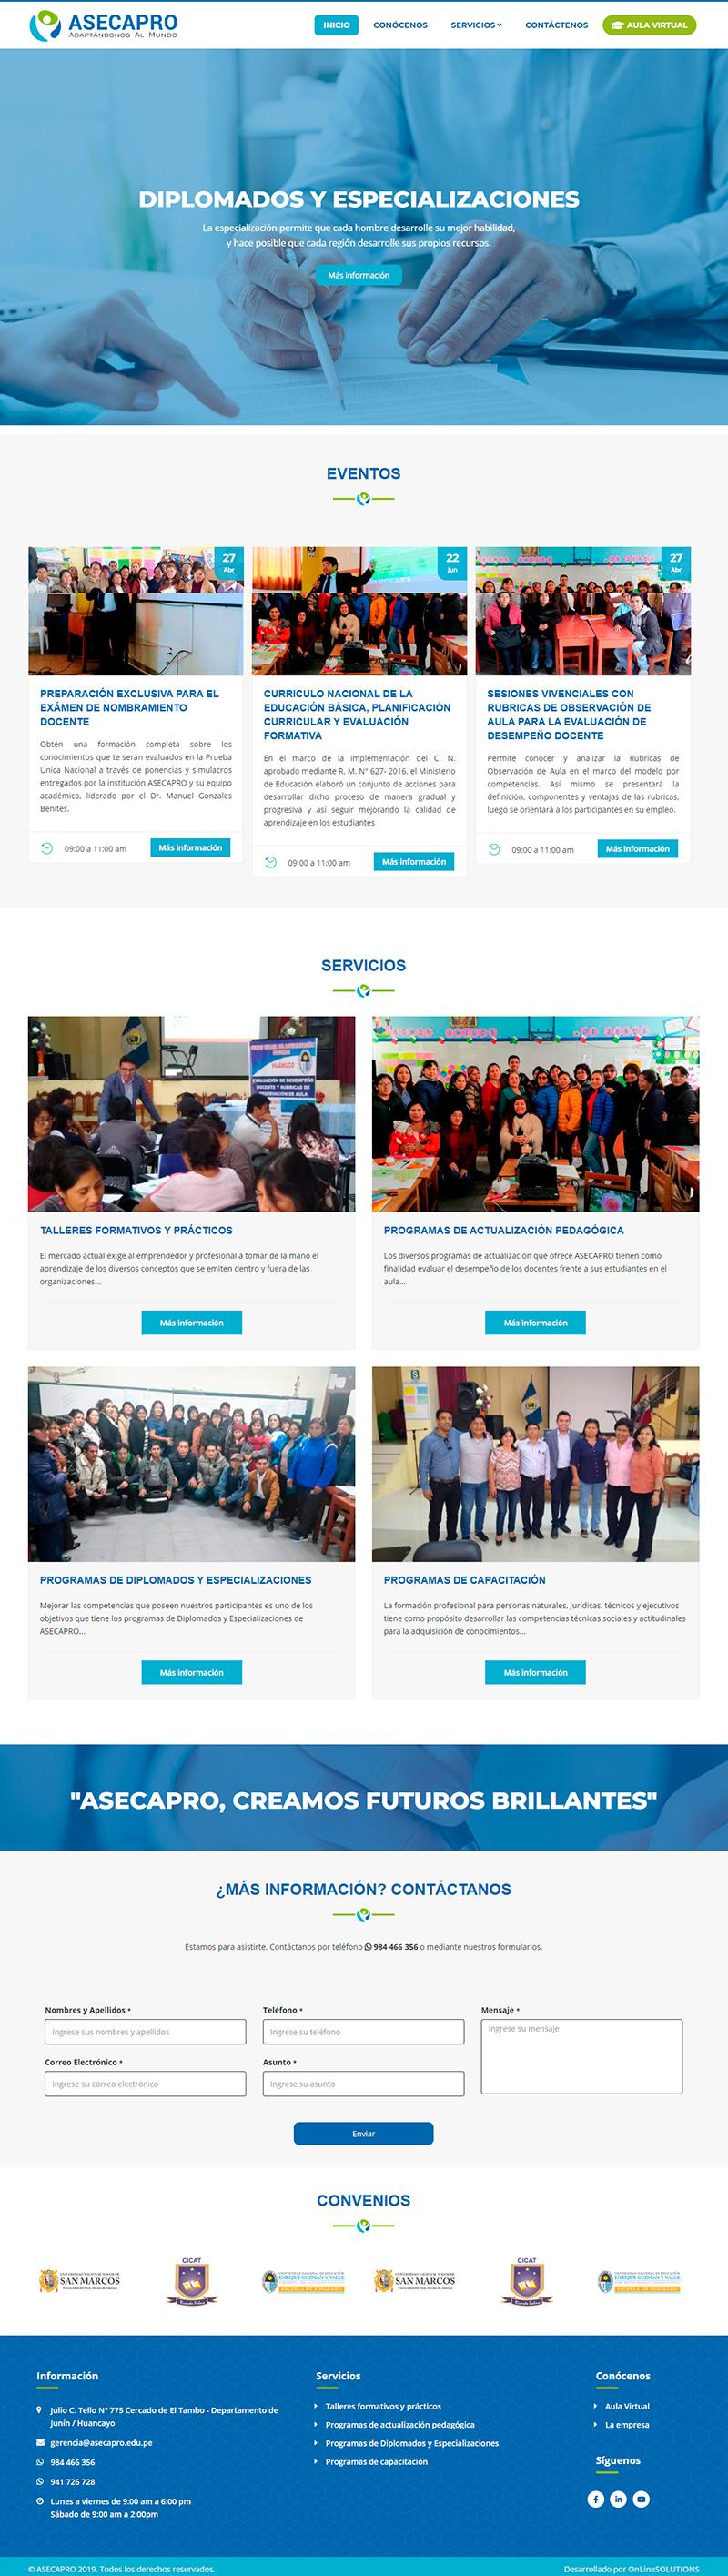 ASECAPRO - Página web